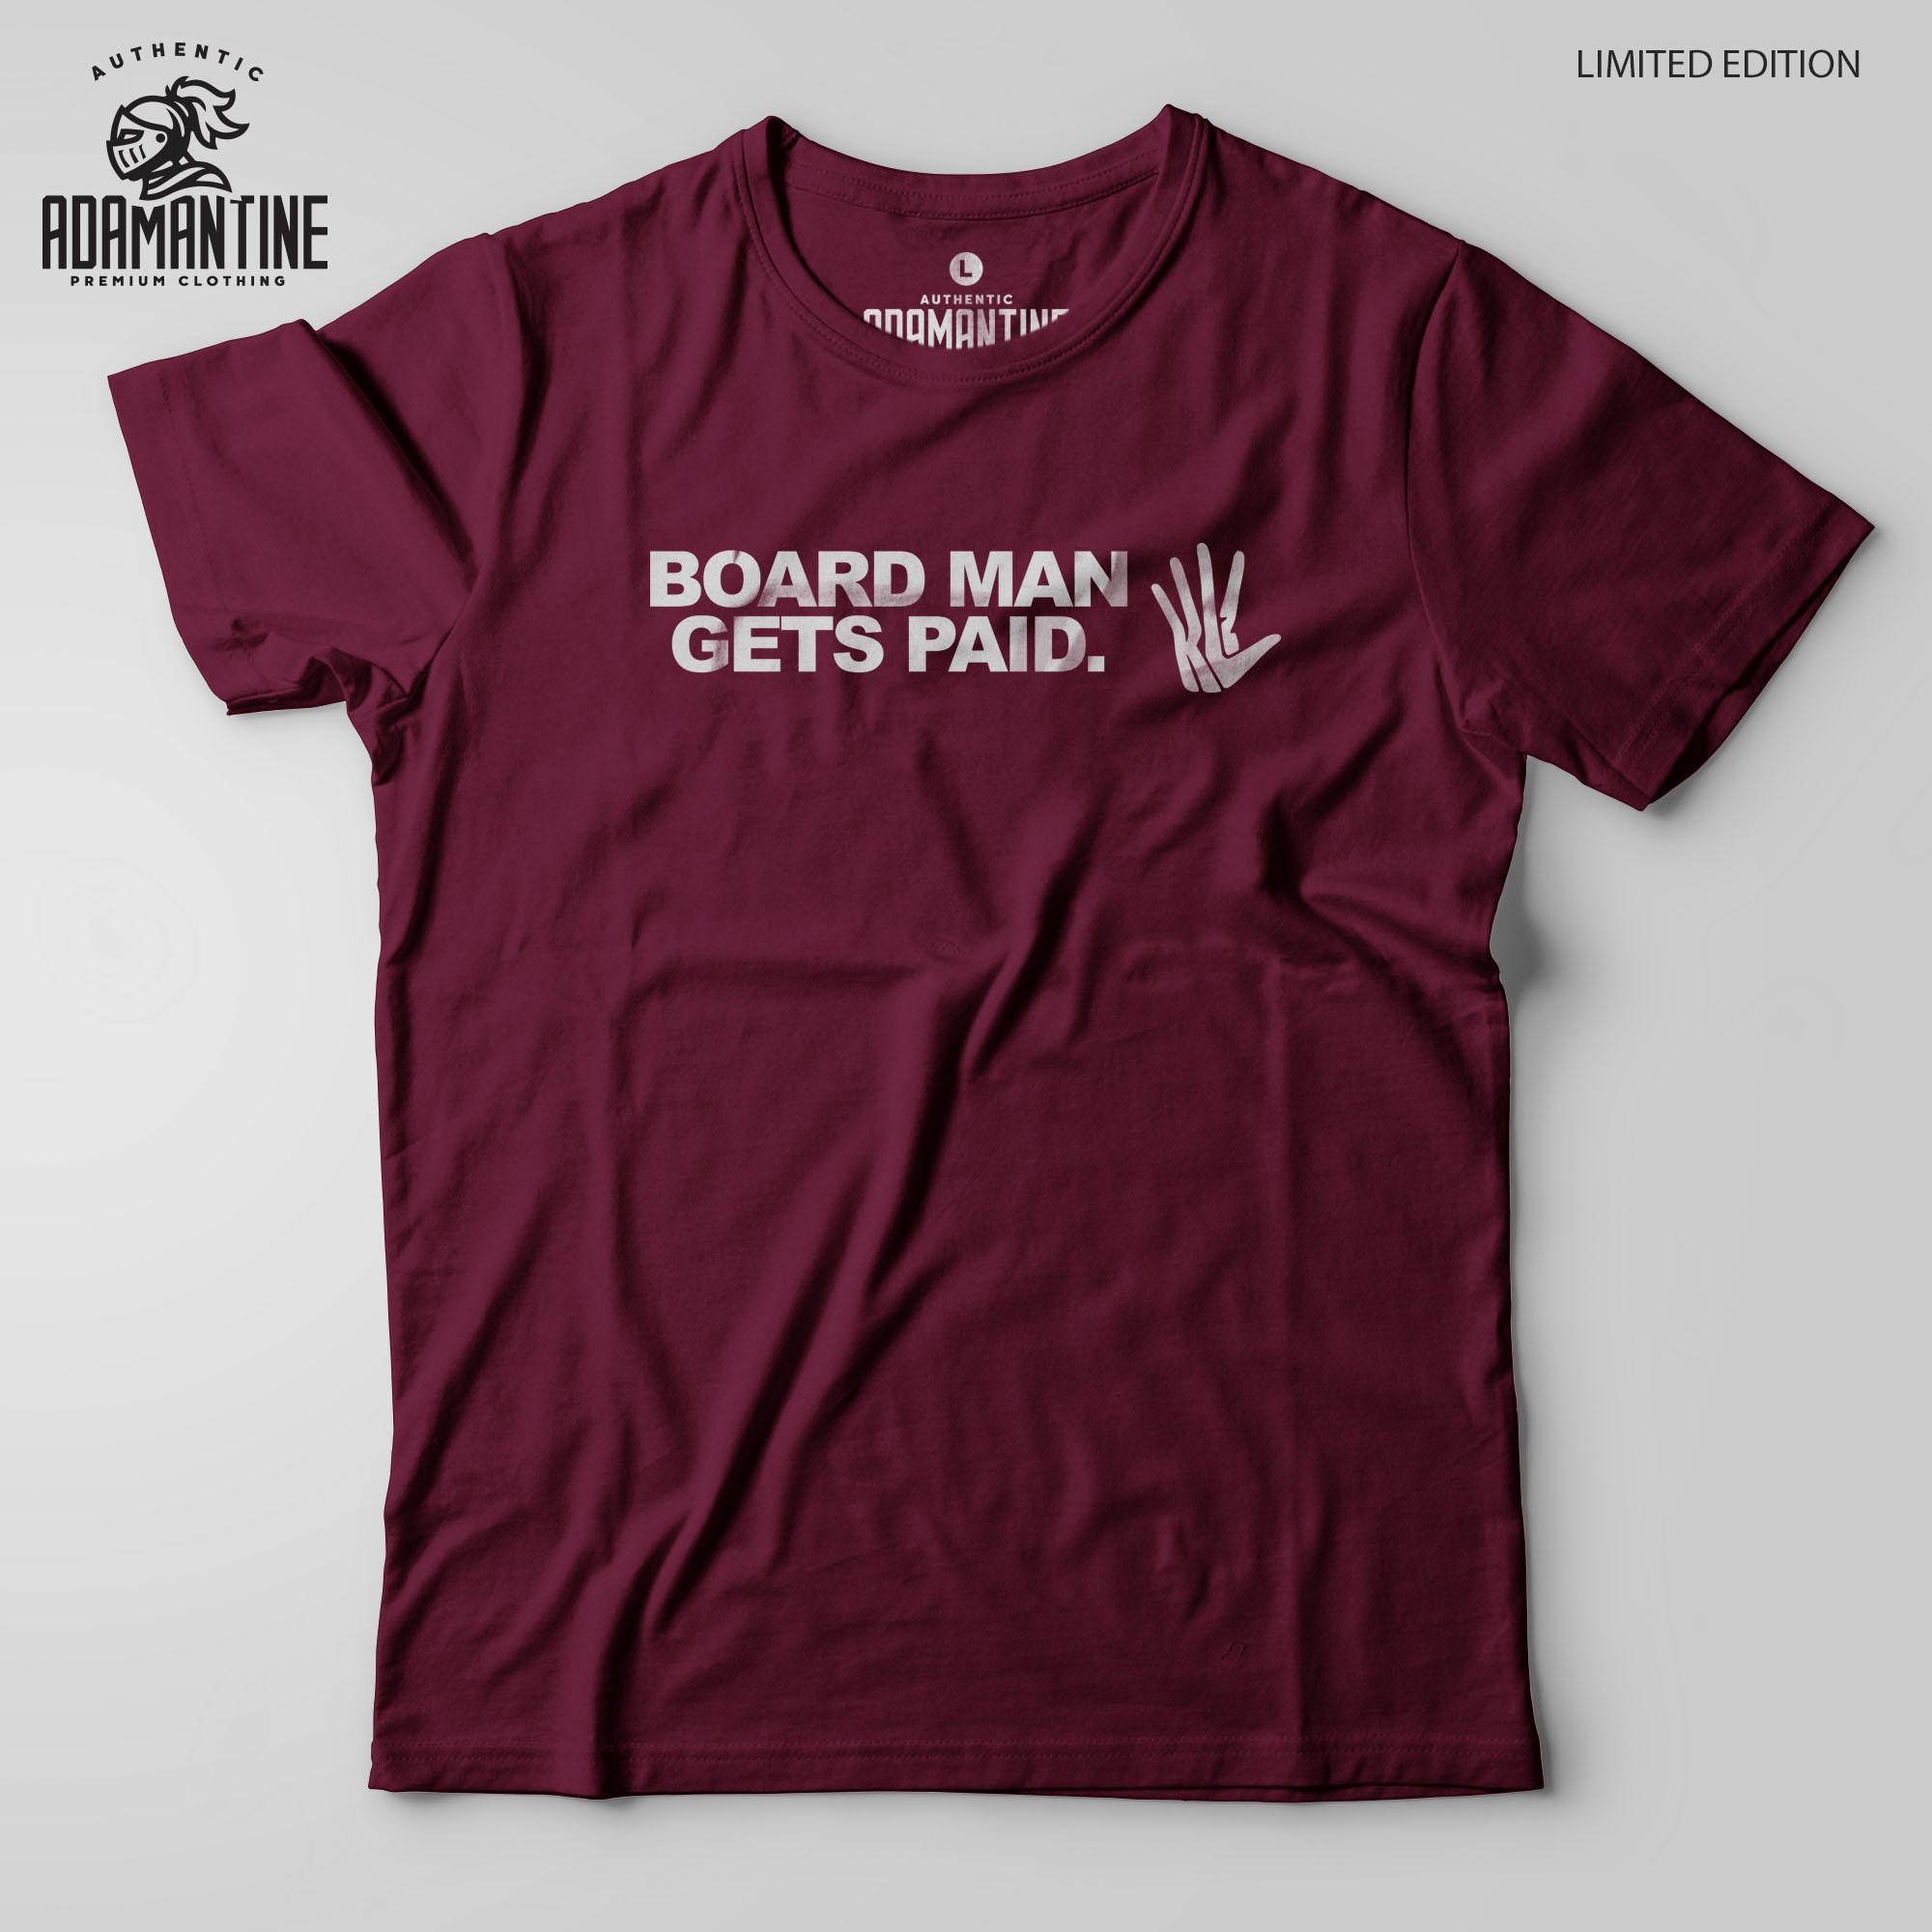 on sale eb380 cca23 Board Man Gets Paid Kawhi Leonard Shirt - Adamantine - BB